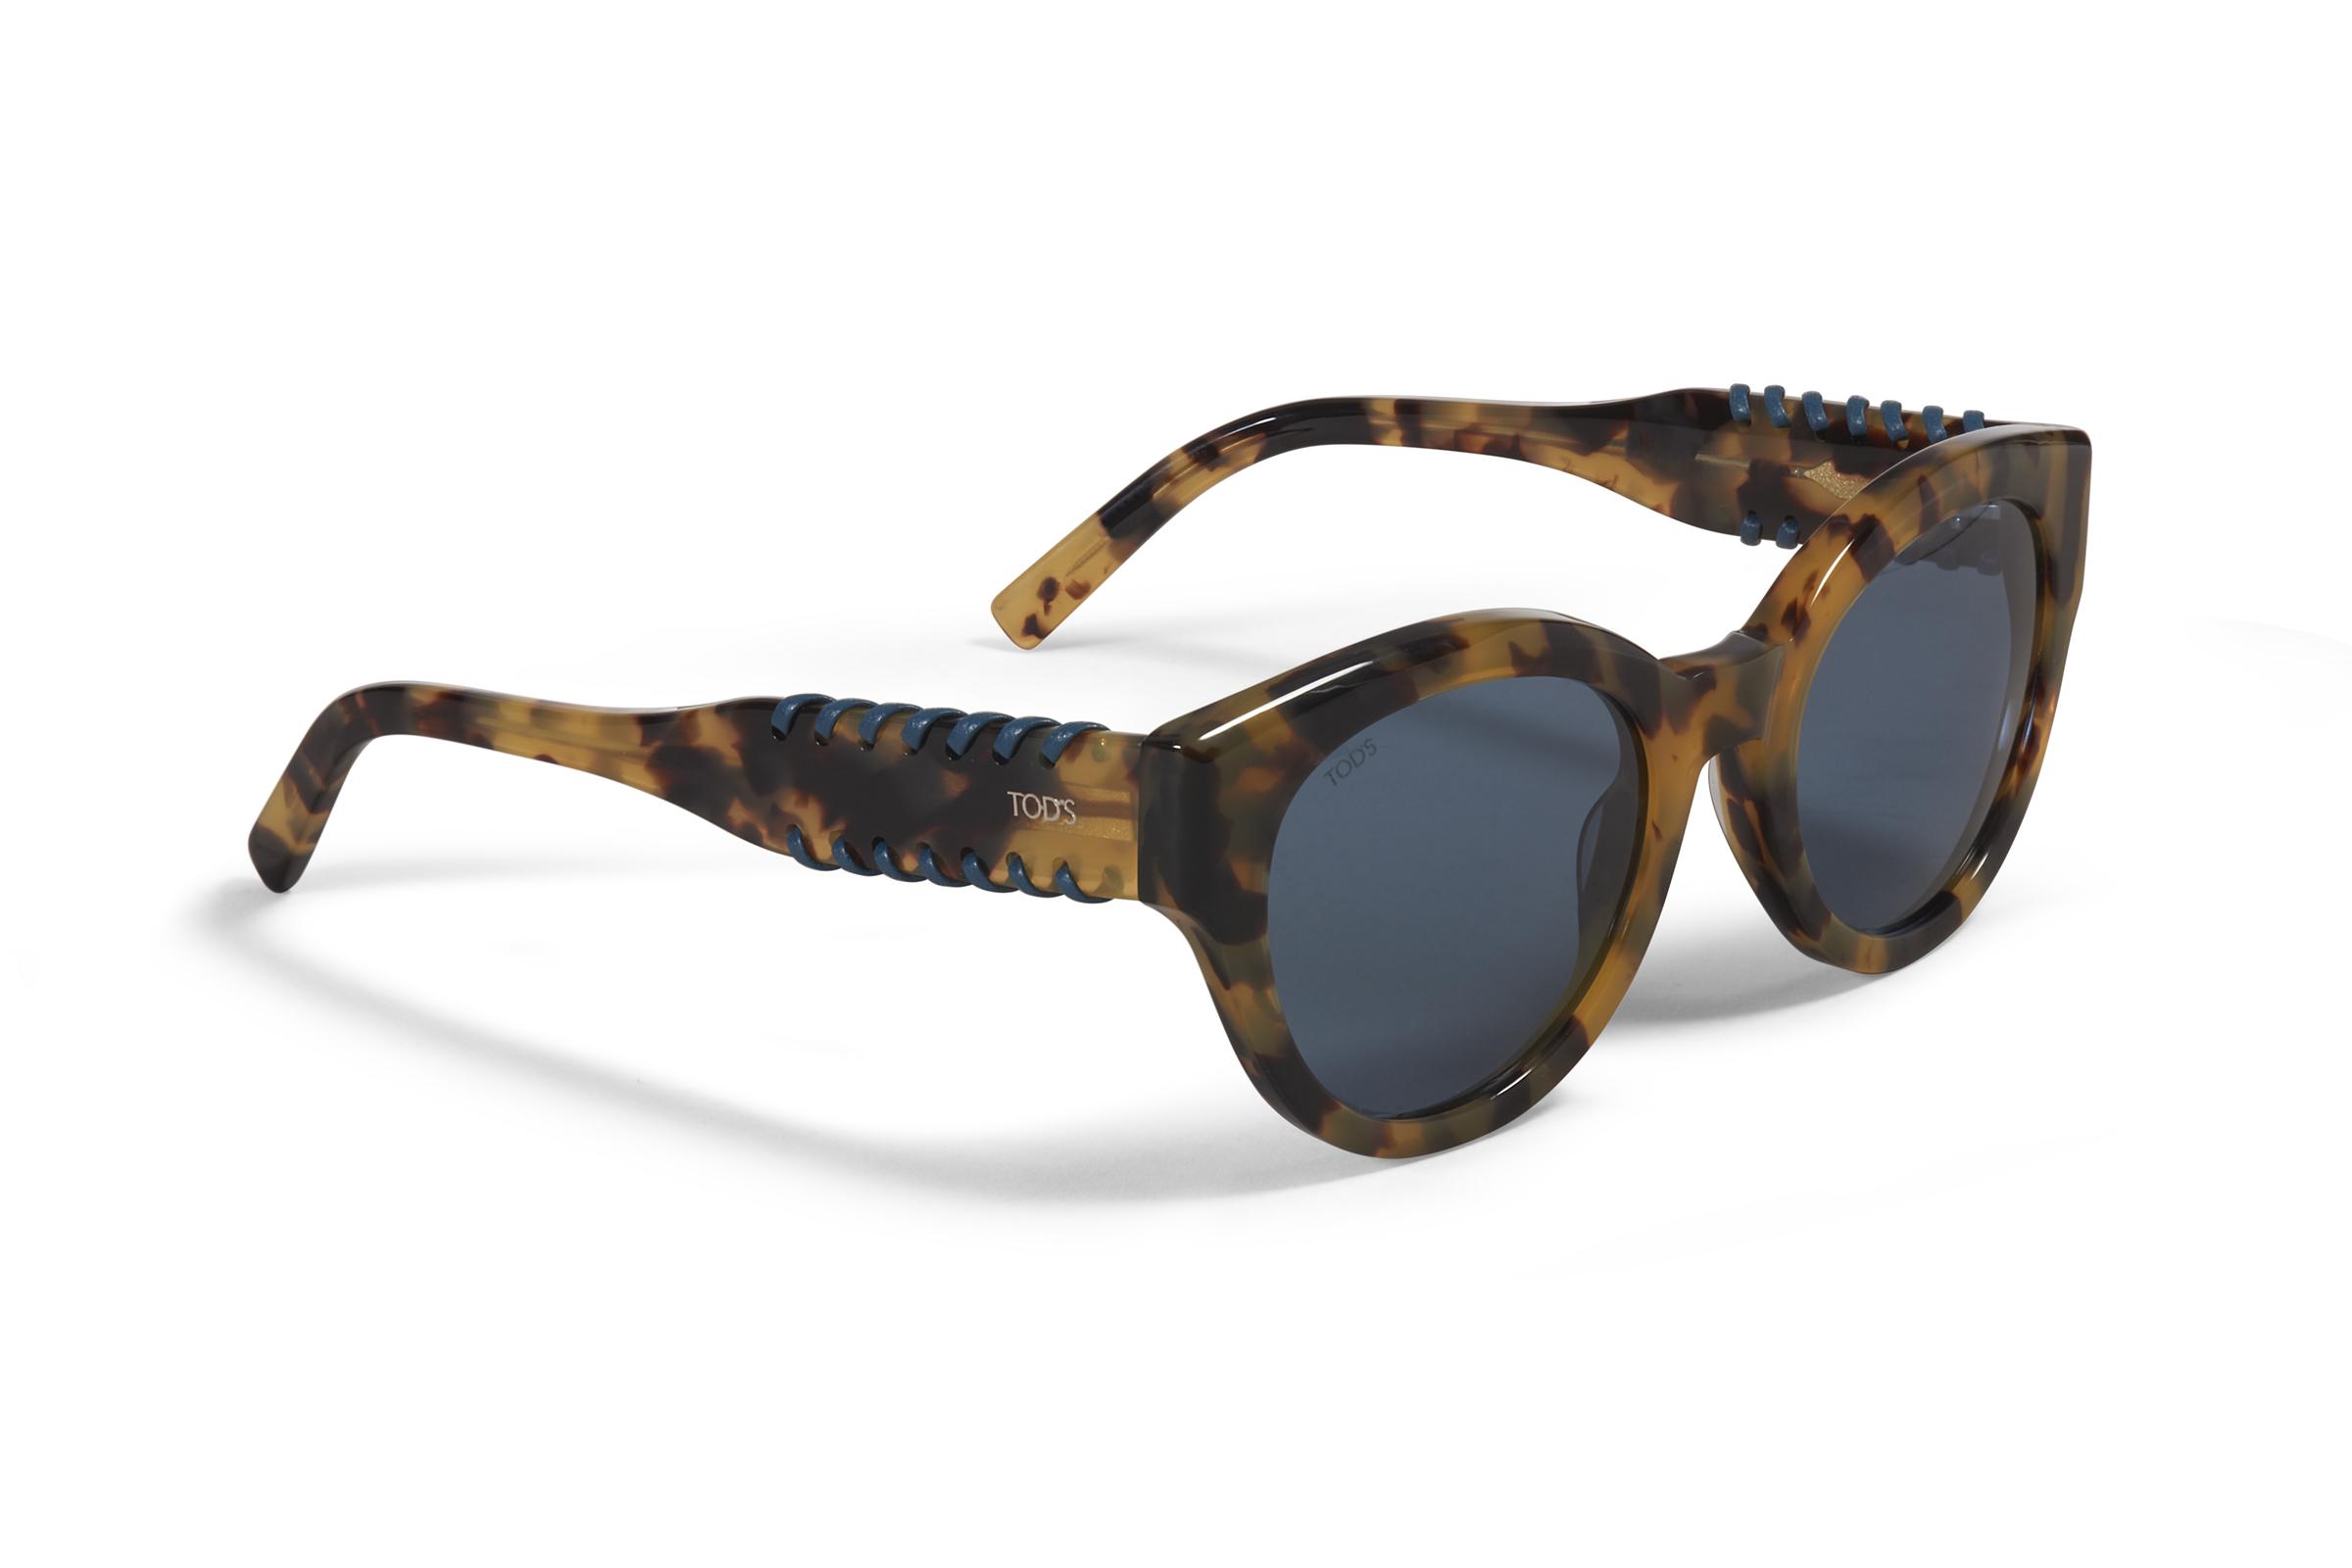 cac0a6e76b Οδηγός Αγοράς  12 ζευγάρια γυαλιά ηλίου σε γήινες αποχρώσεις για ...